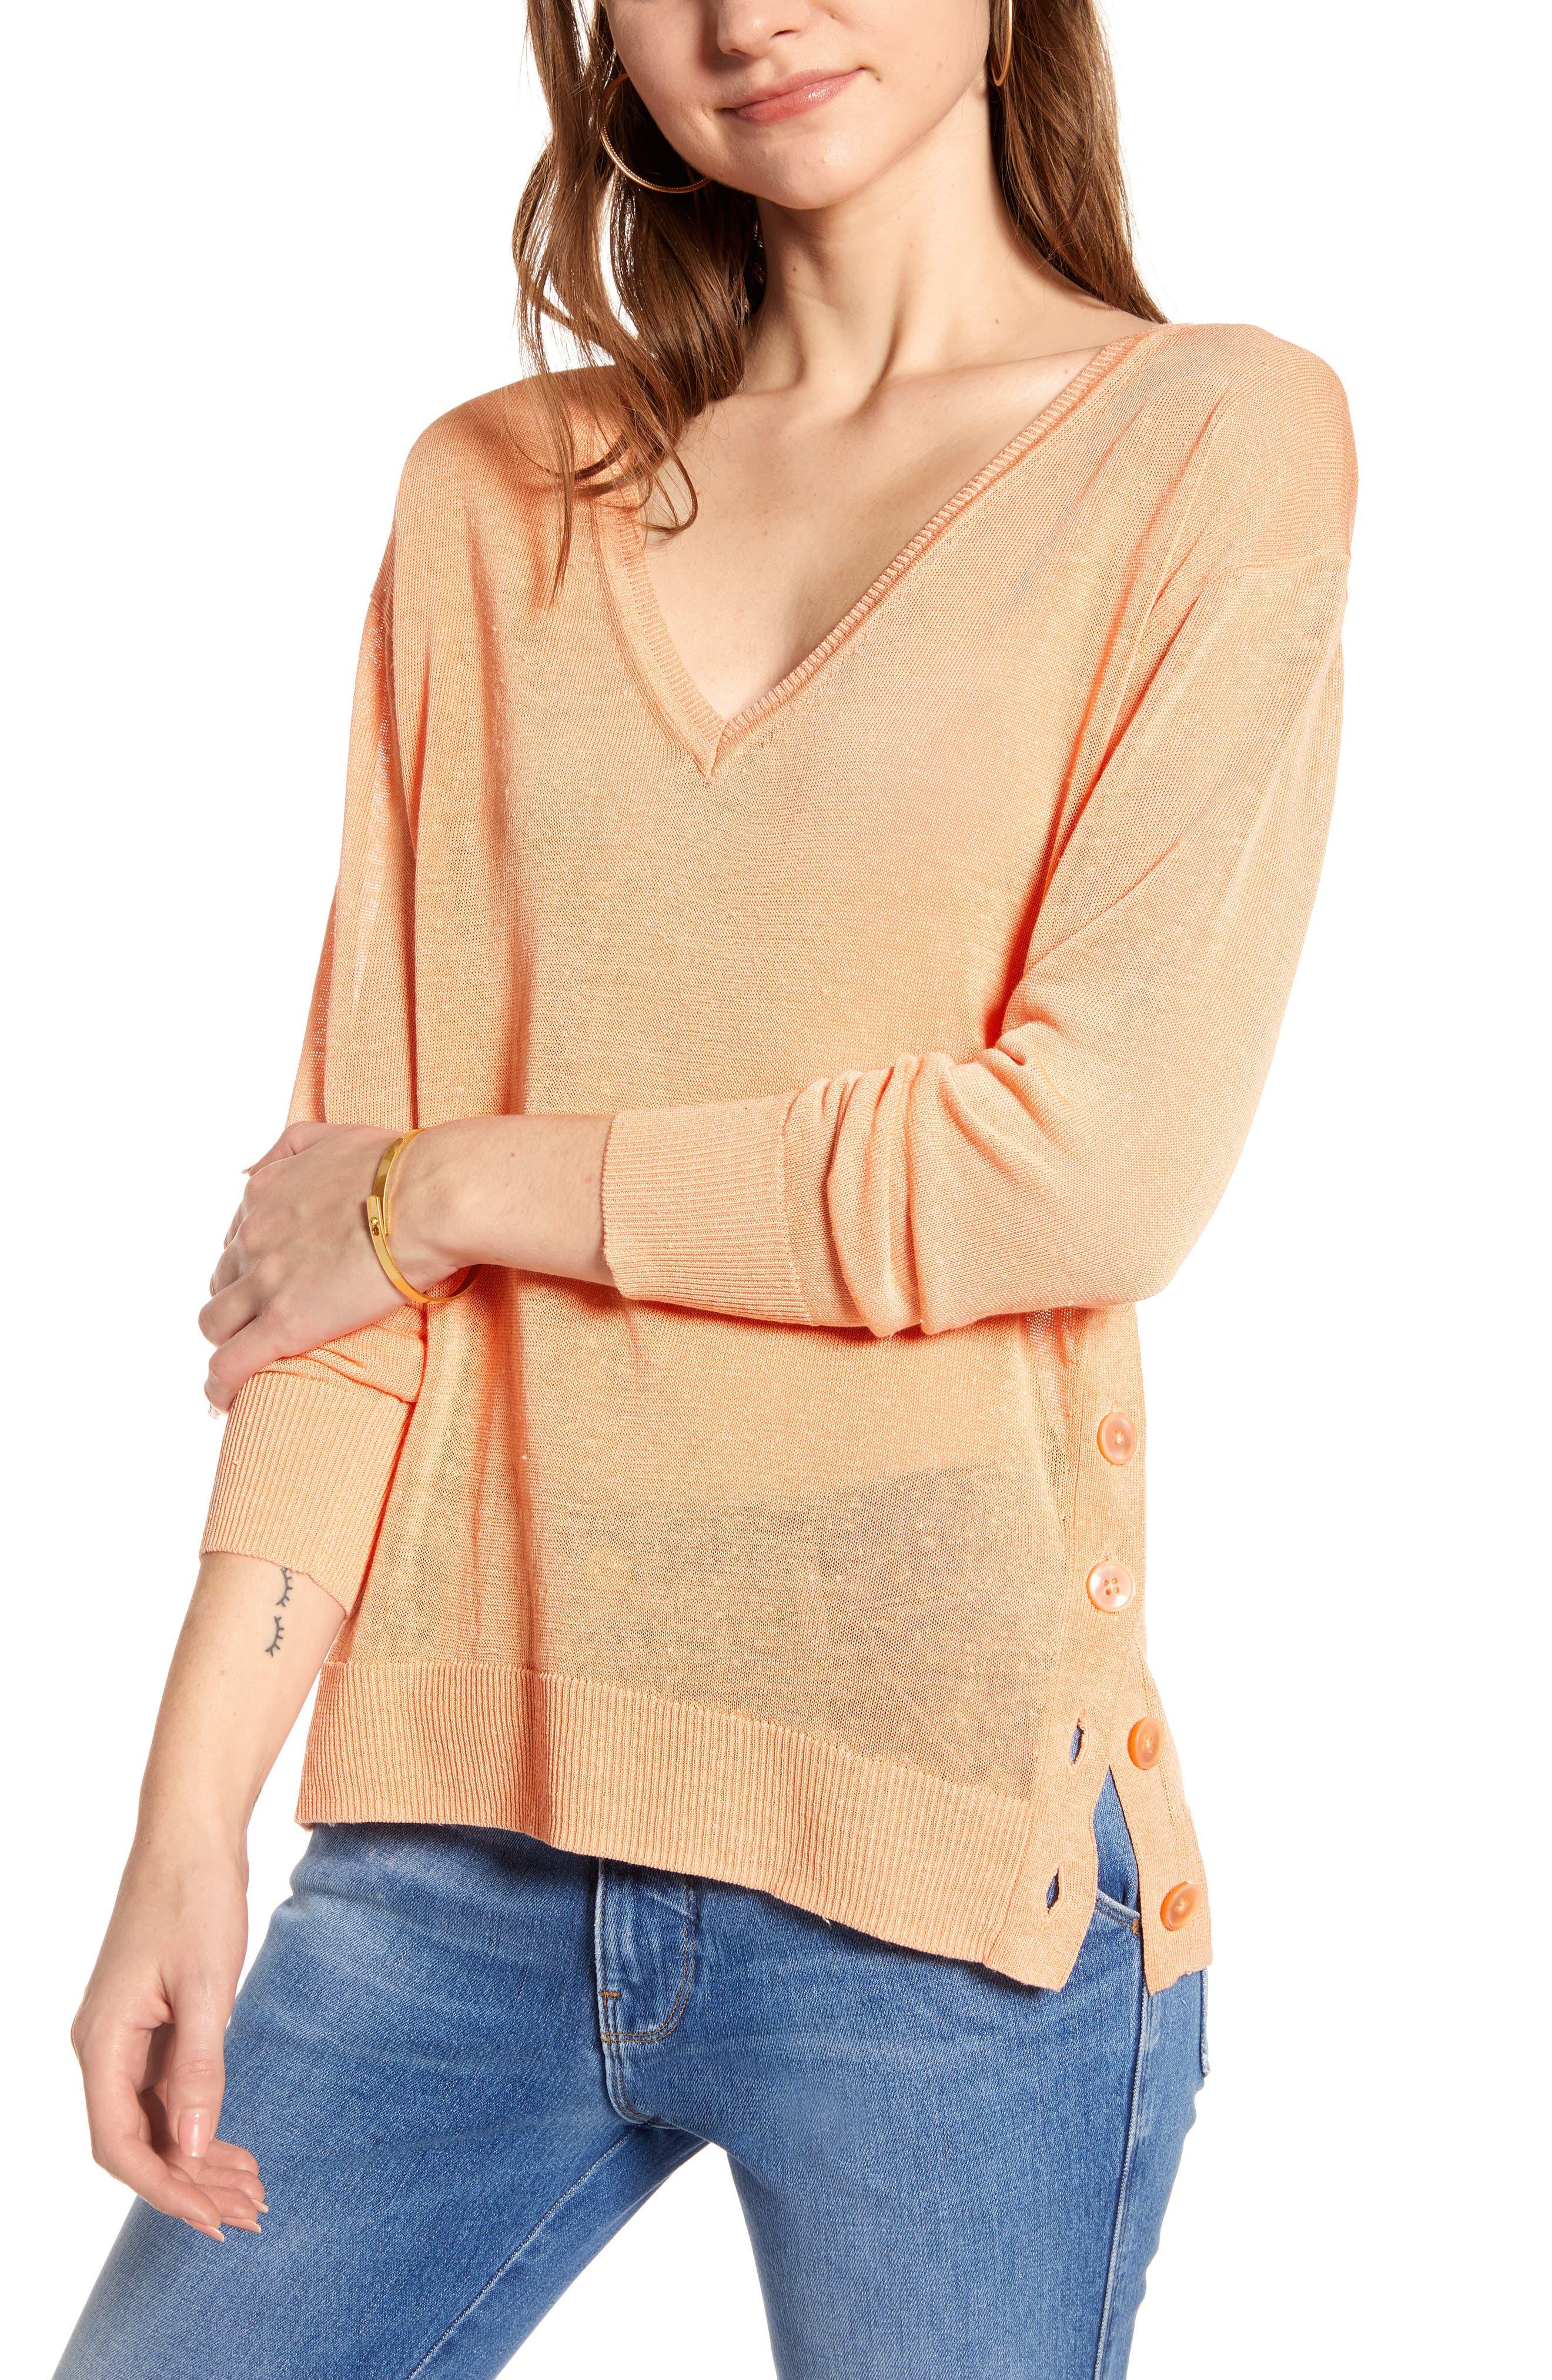 J.crew Side Button Linen Blend V-Neck Sweater, Coral